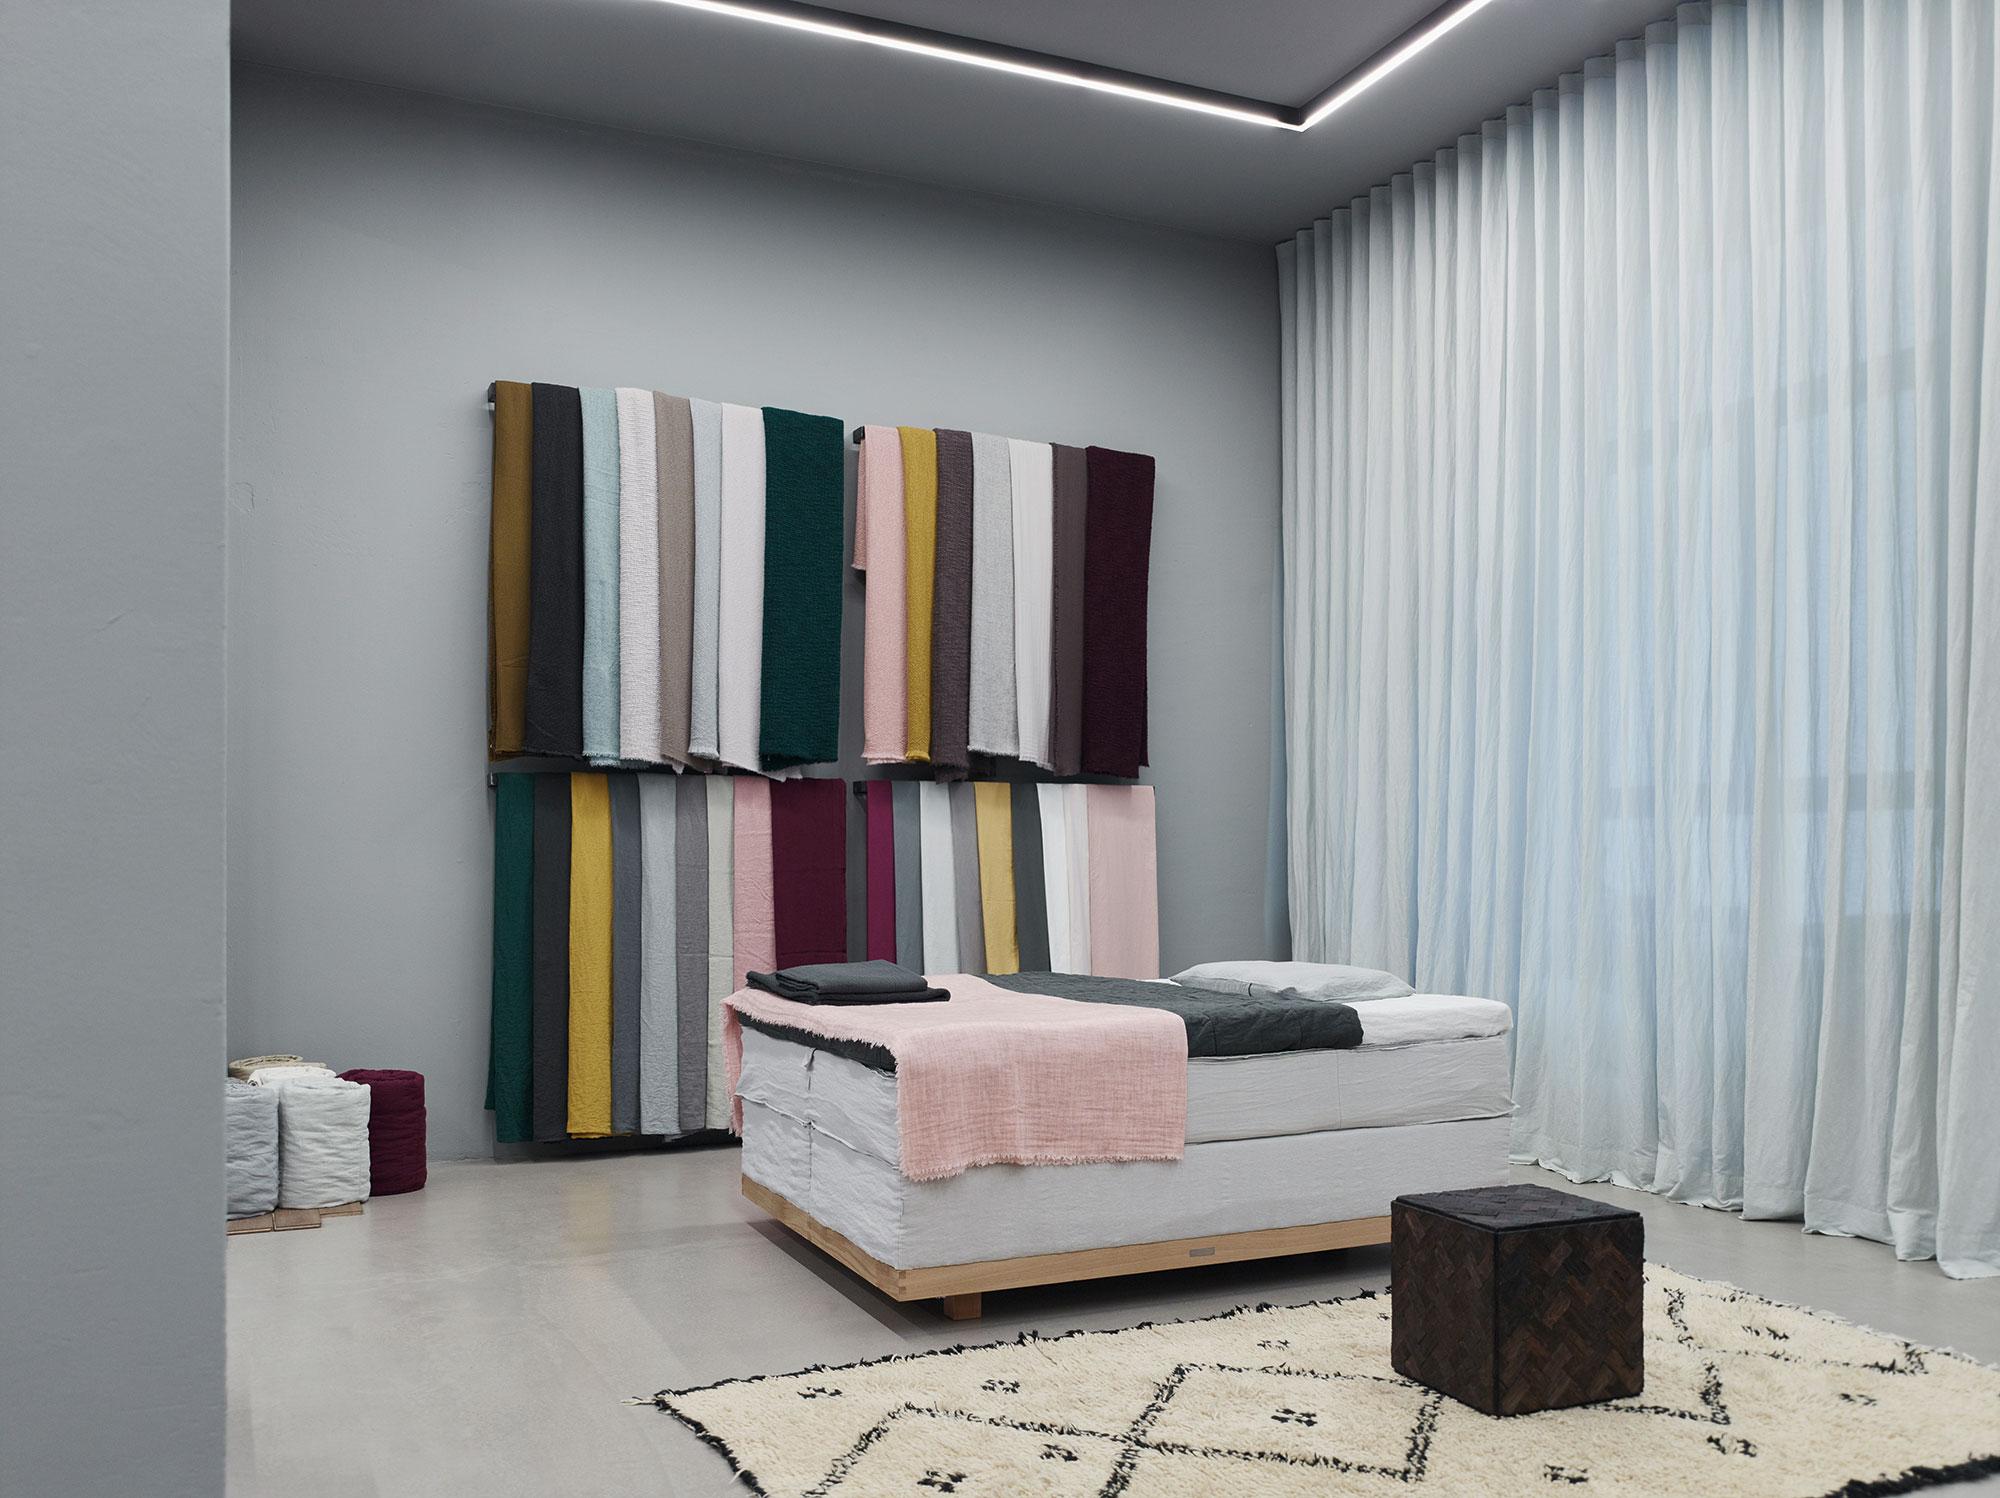 100 1207 best mexican interior design bradenton beach vacation rental 1207 gulf dr n bradenton. Black Bedroom Furniture Sets. Home Design Ideas